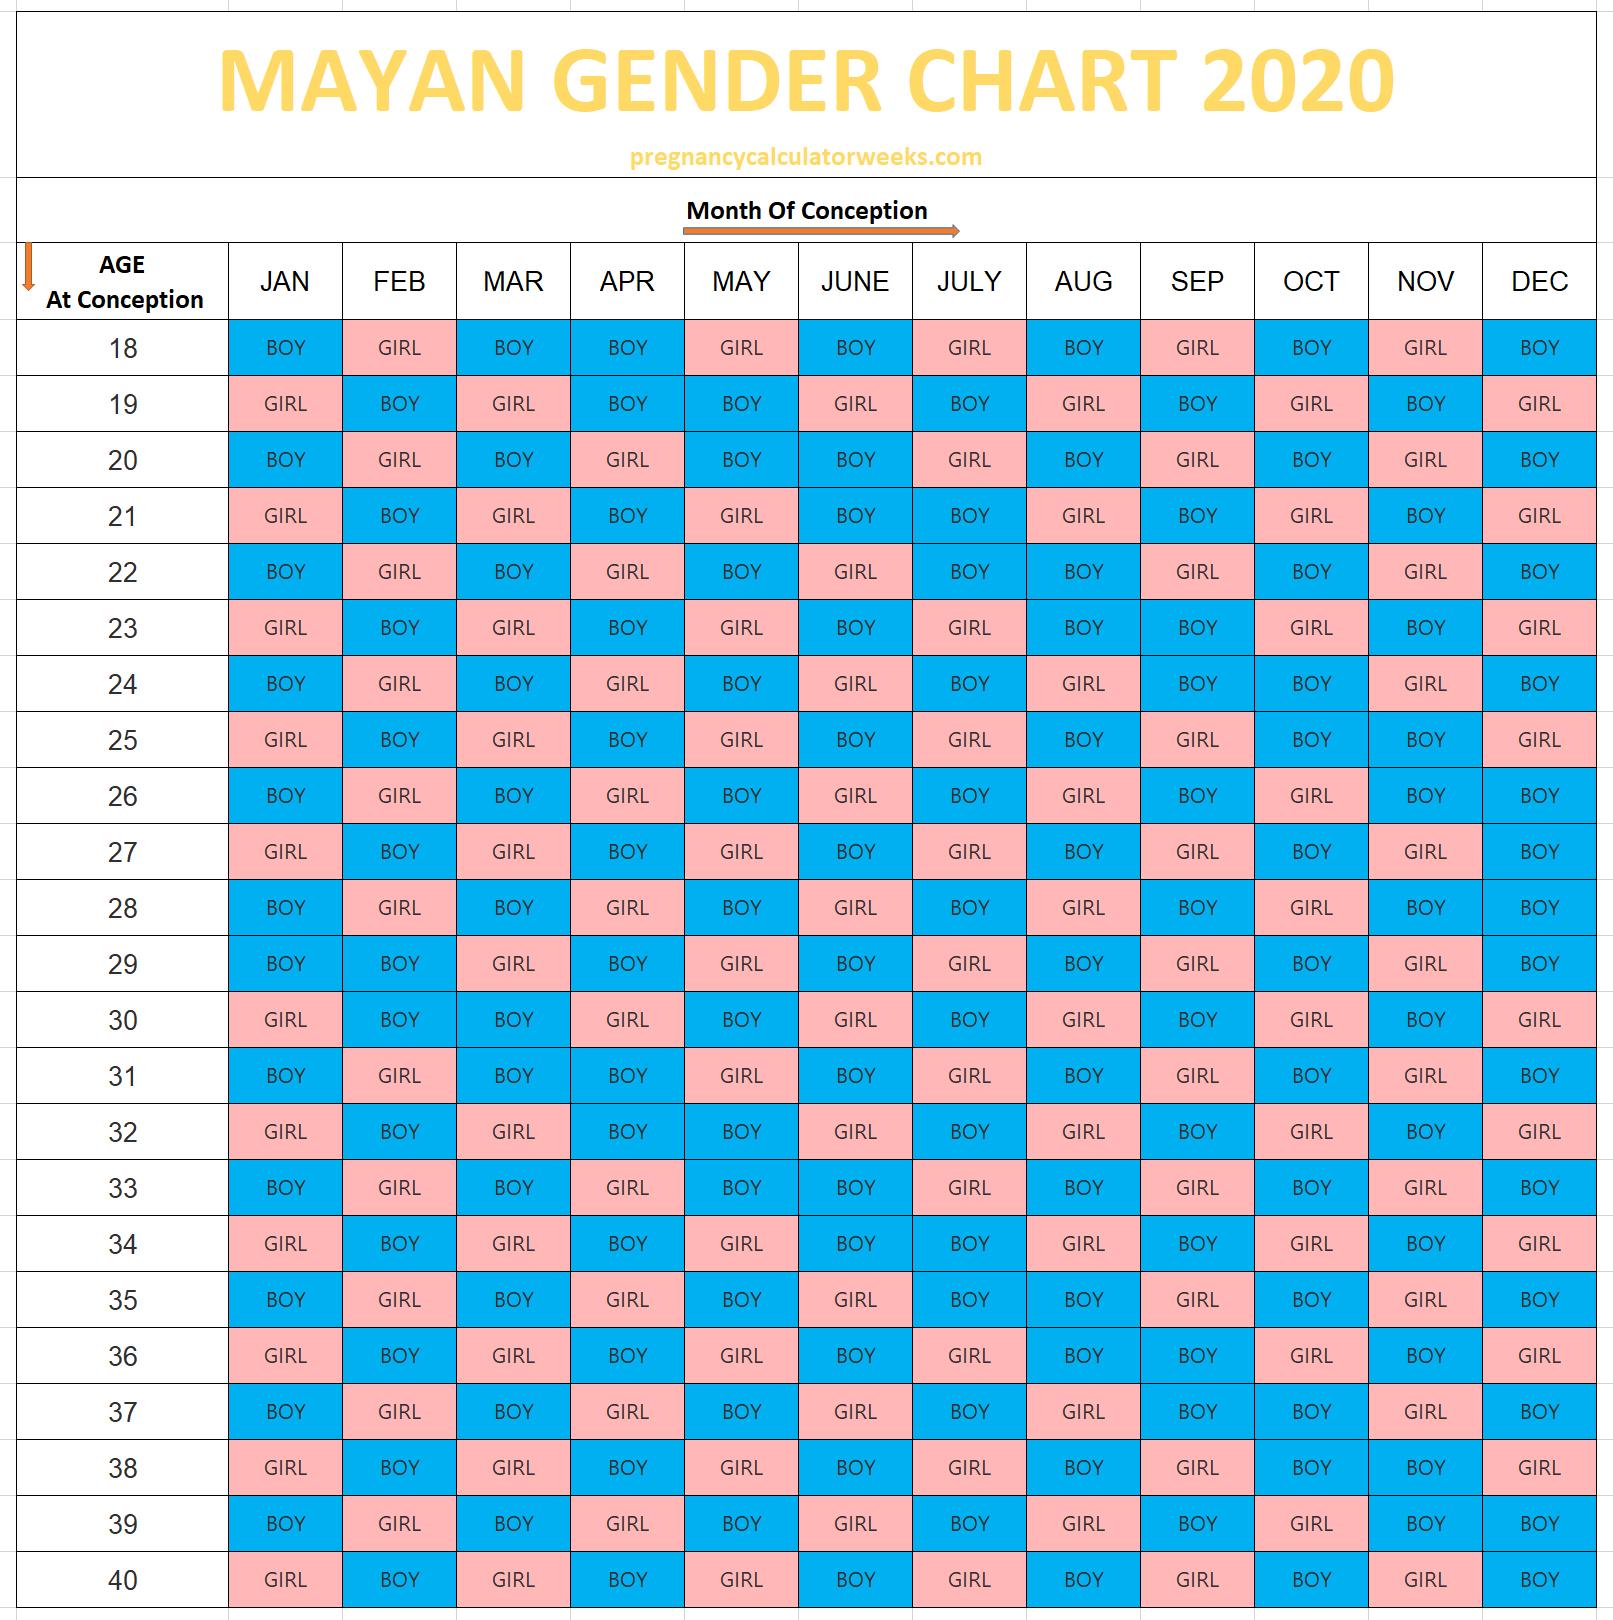 Mayan Baby Gender Predictor Chart & Calendar 2020 within Mayan Gender Predictor